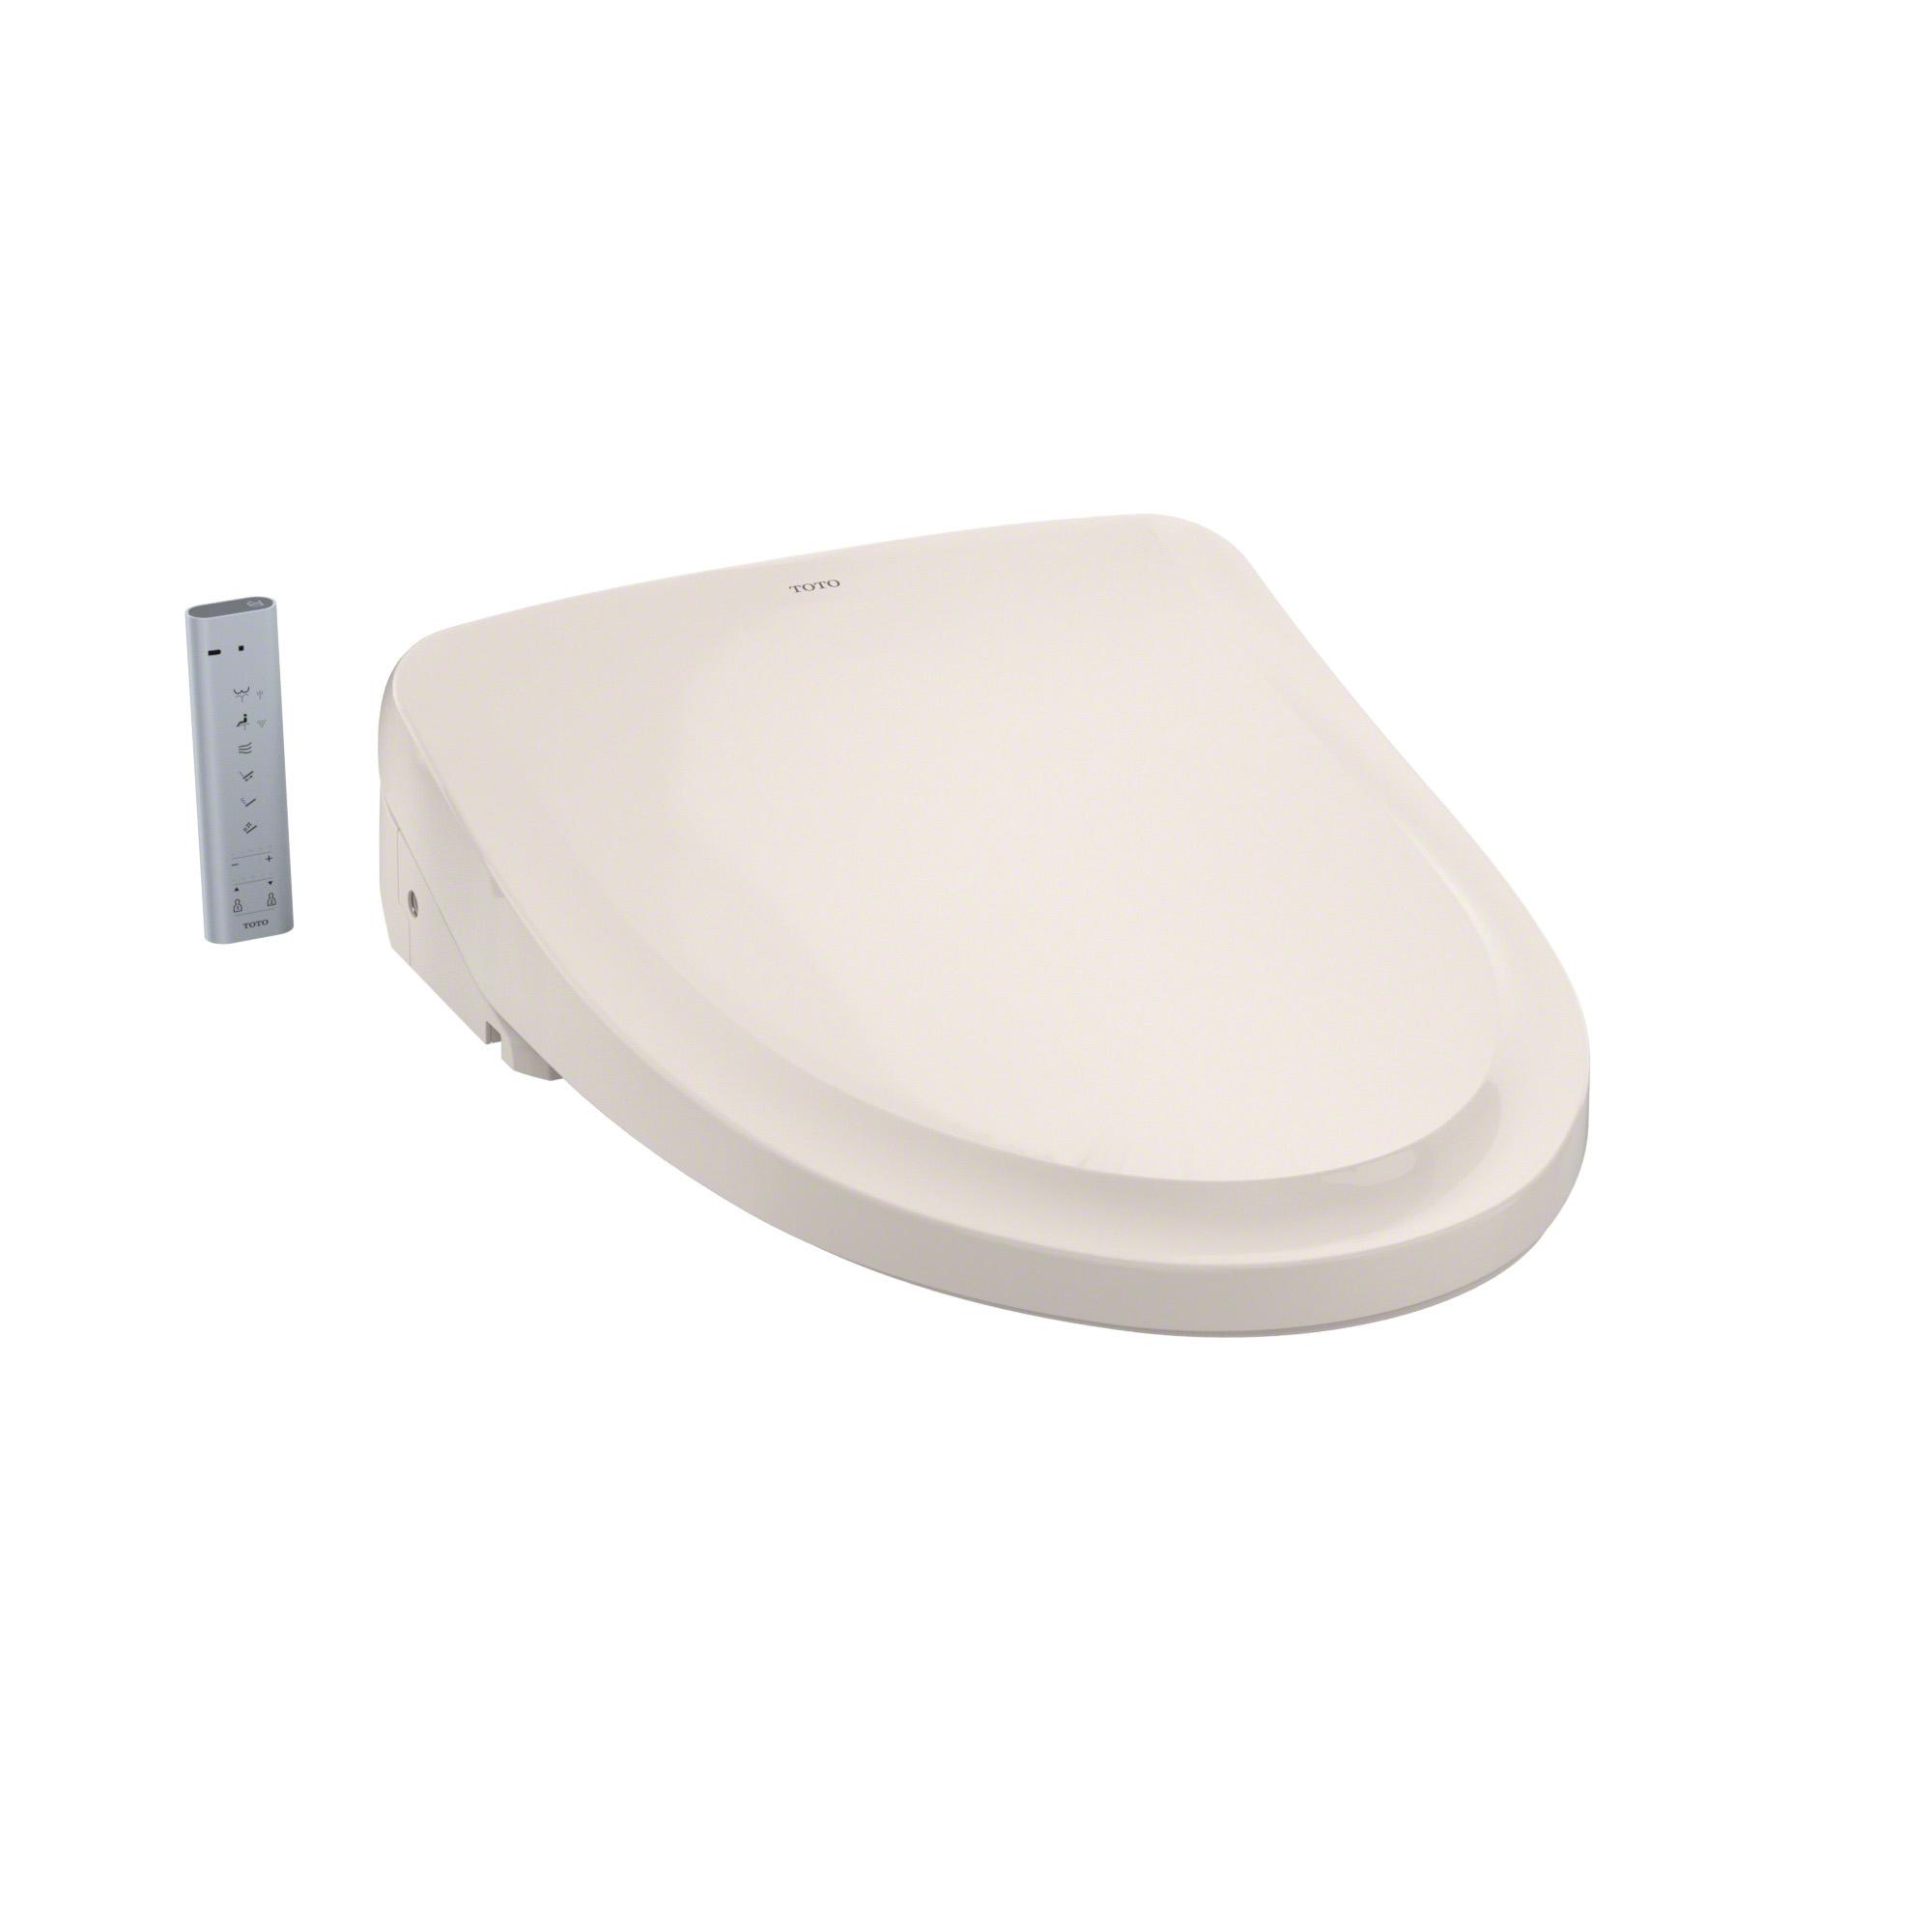 Toto® SW3054#12 WASHLET® S550e Electronic Bidet Toilet Seat With ewater+® Technology, Elongated Bowl, Auto Open/Closed Front, Plastic, Sedona Beige, Import